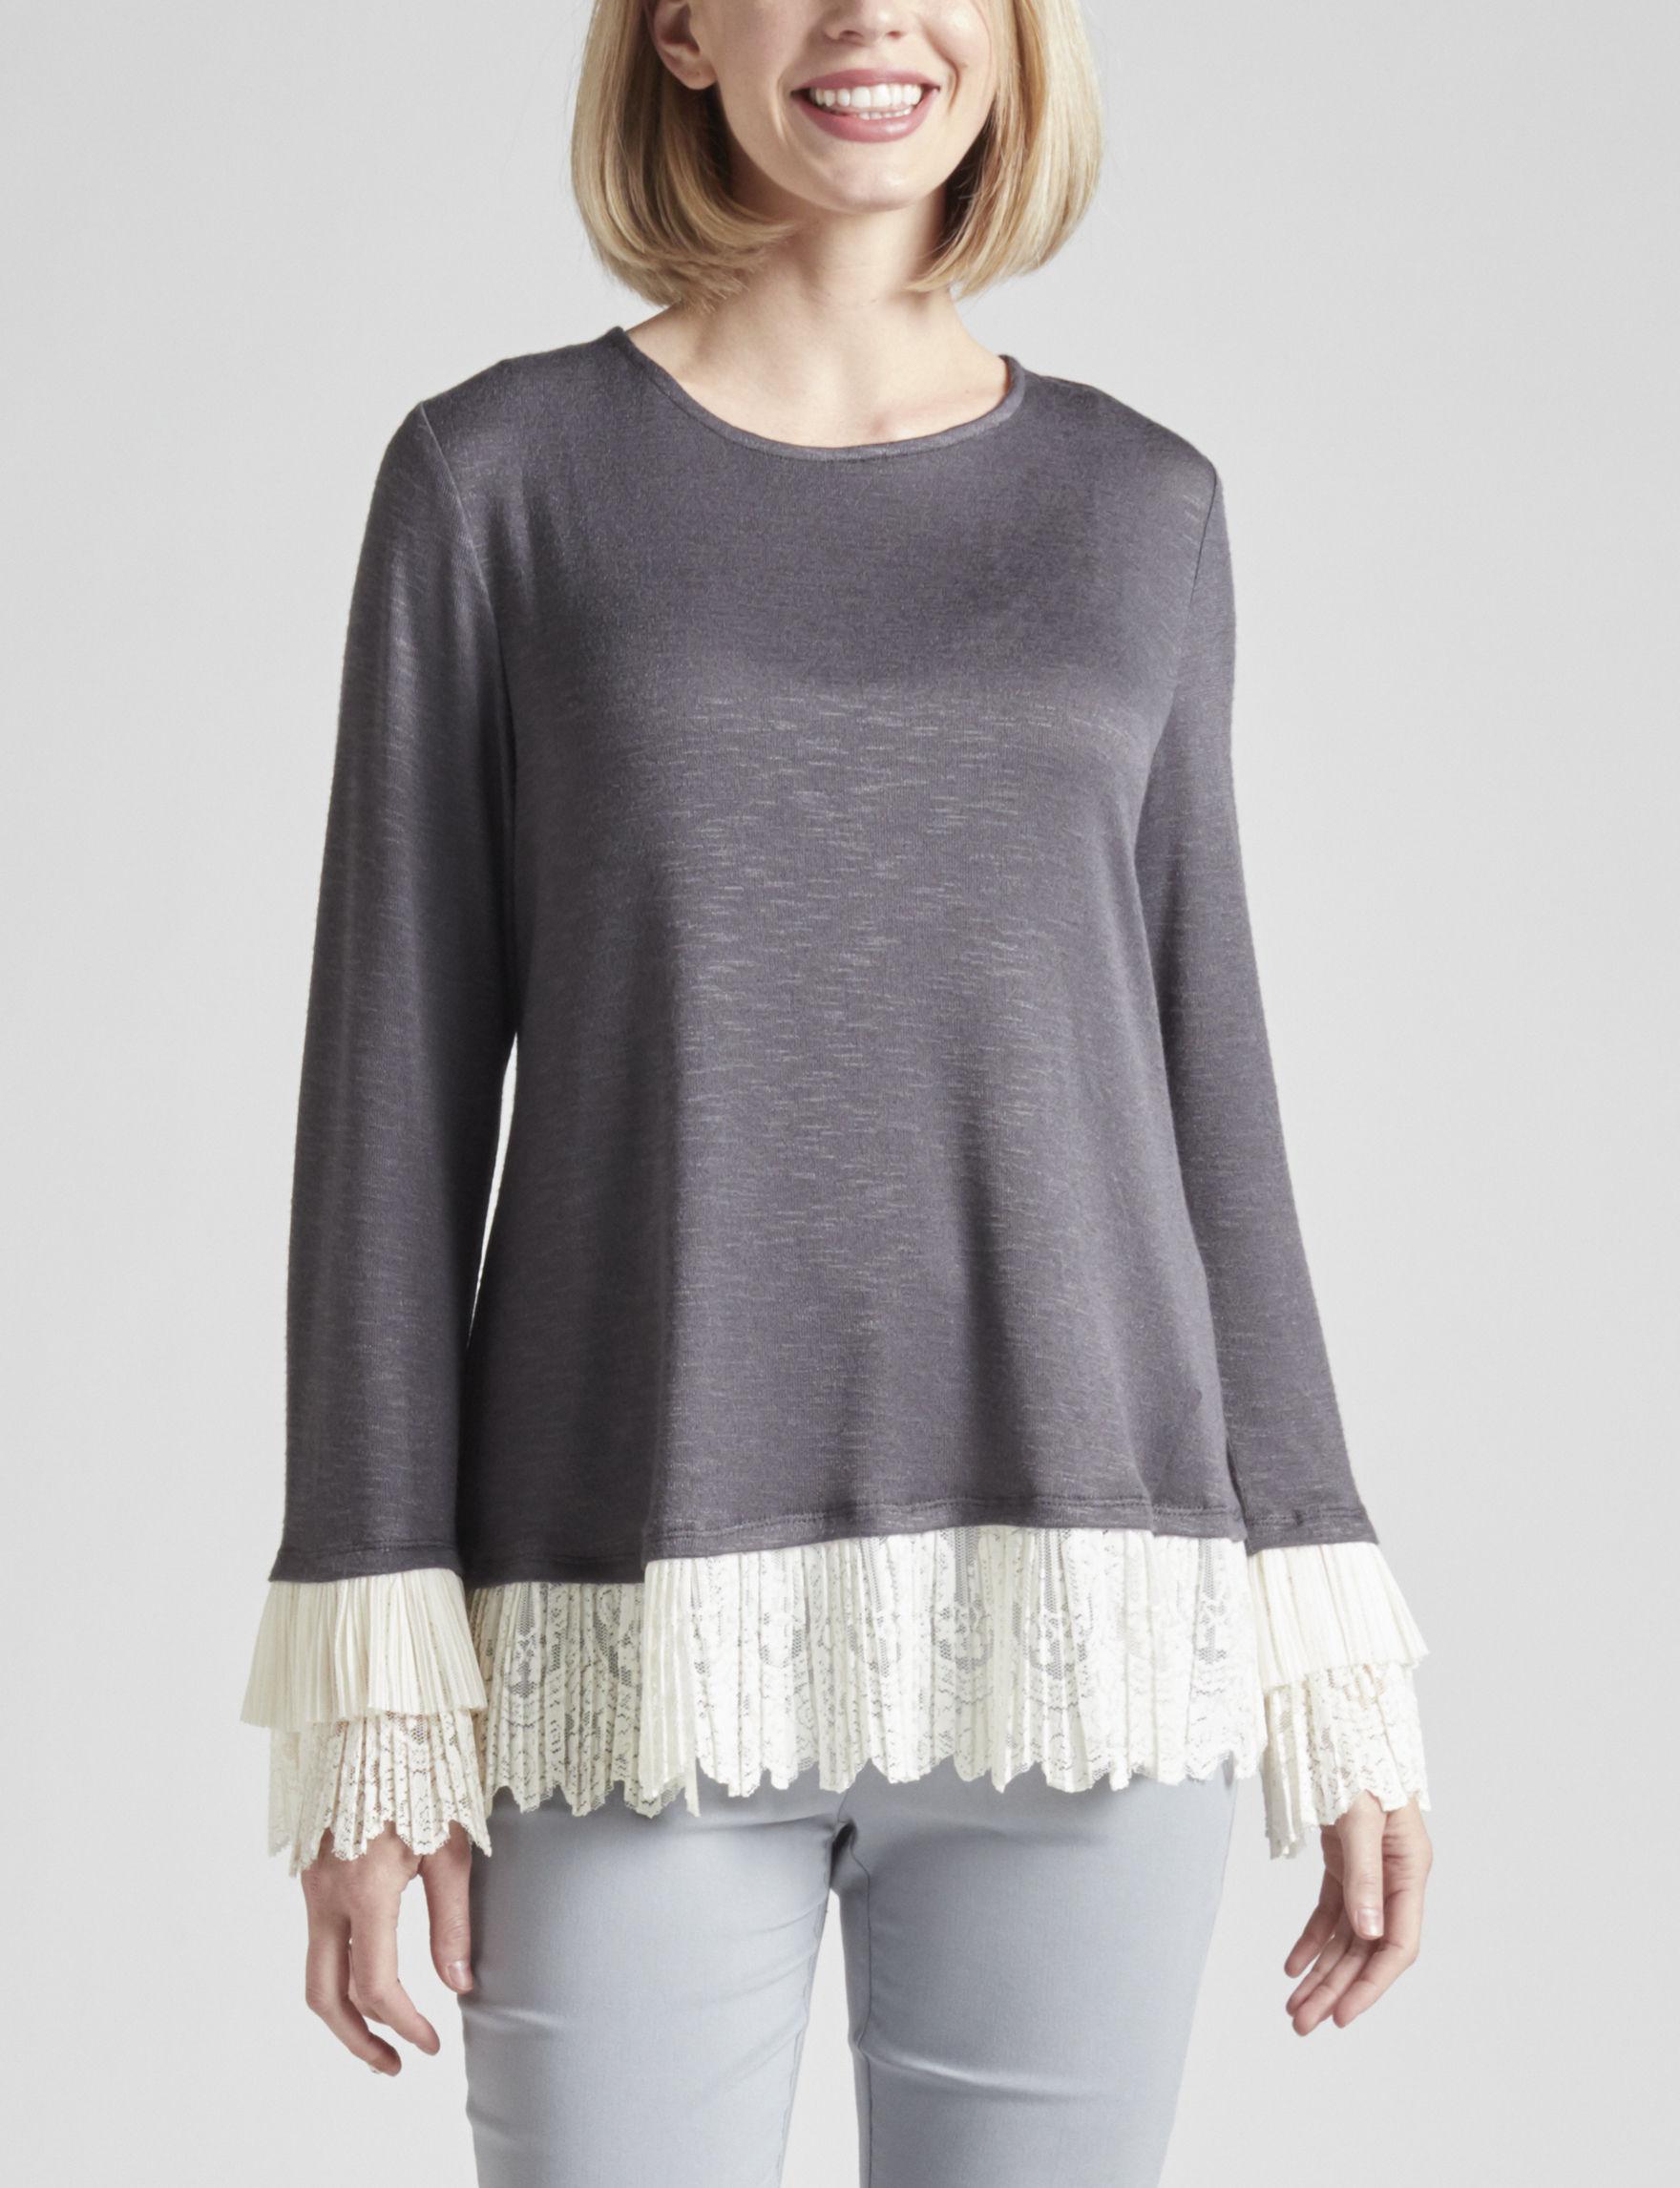 Zac & Rachel Charcoal Shirts & Blouses